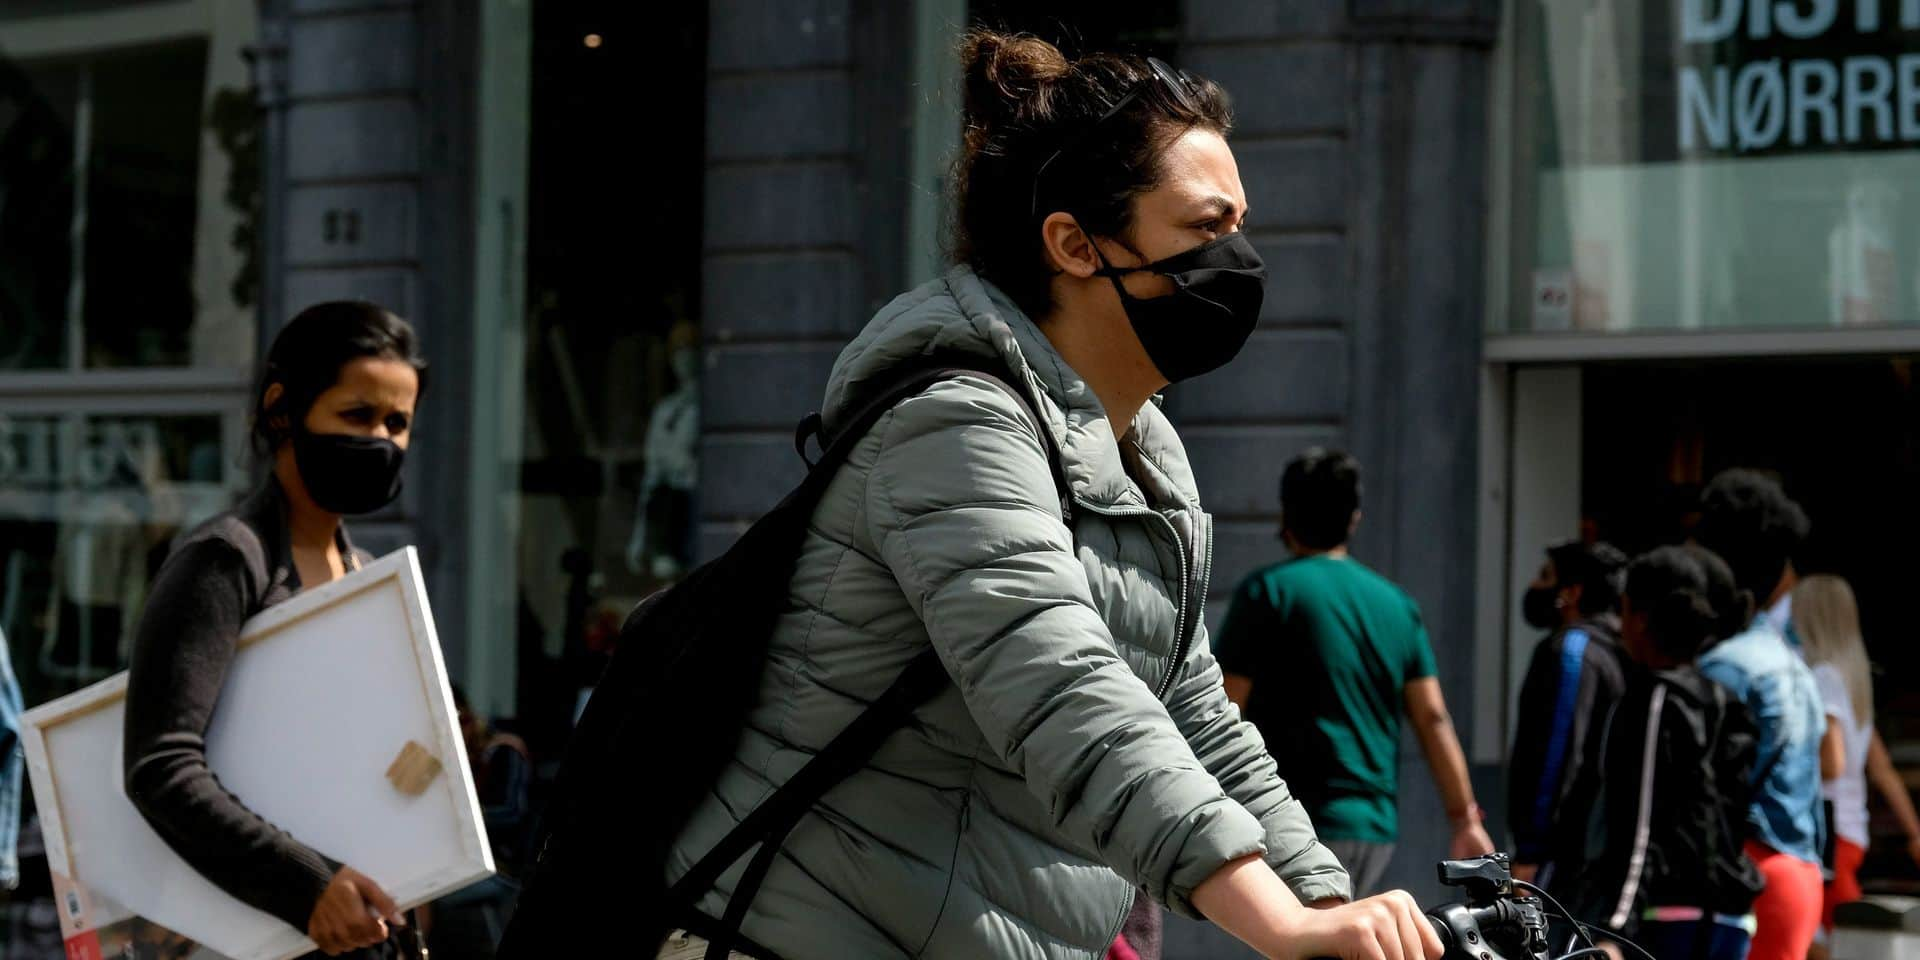 Coronavirus: à Anvers, la police a déjà fermé neuf cafés samedi